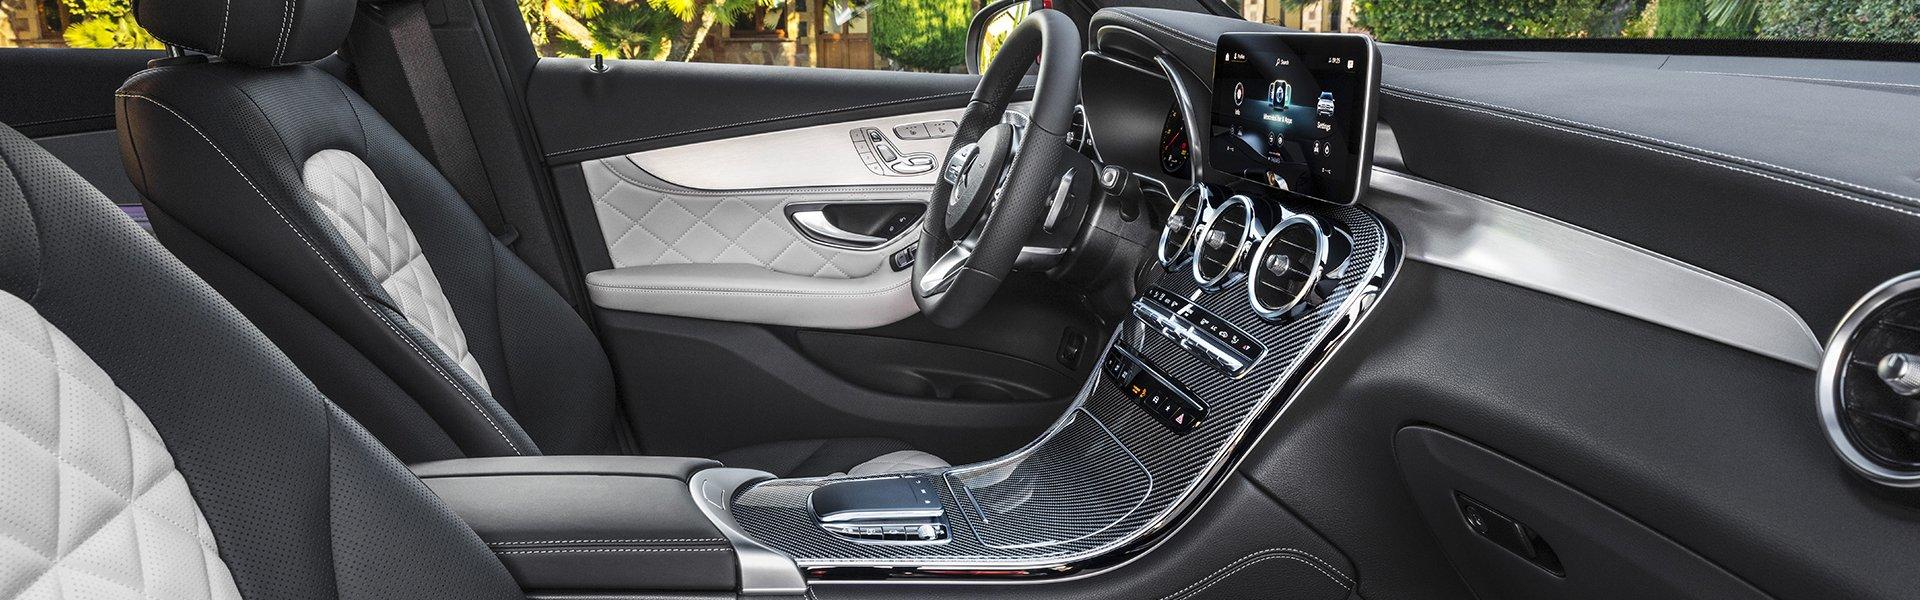 Mercedes-AMG GLC купе